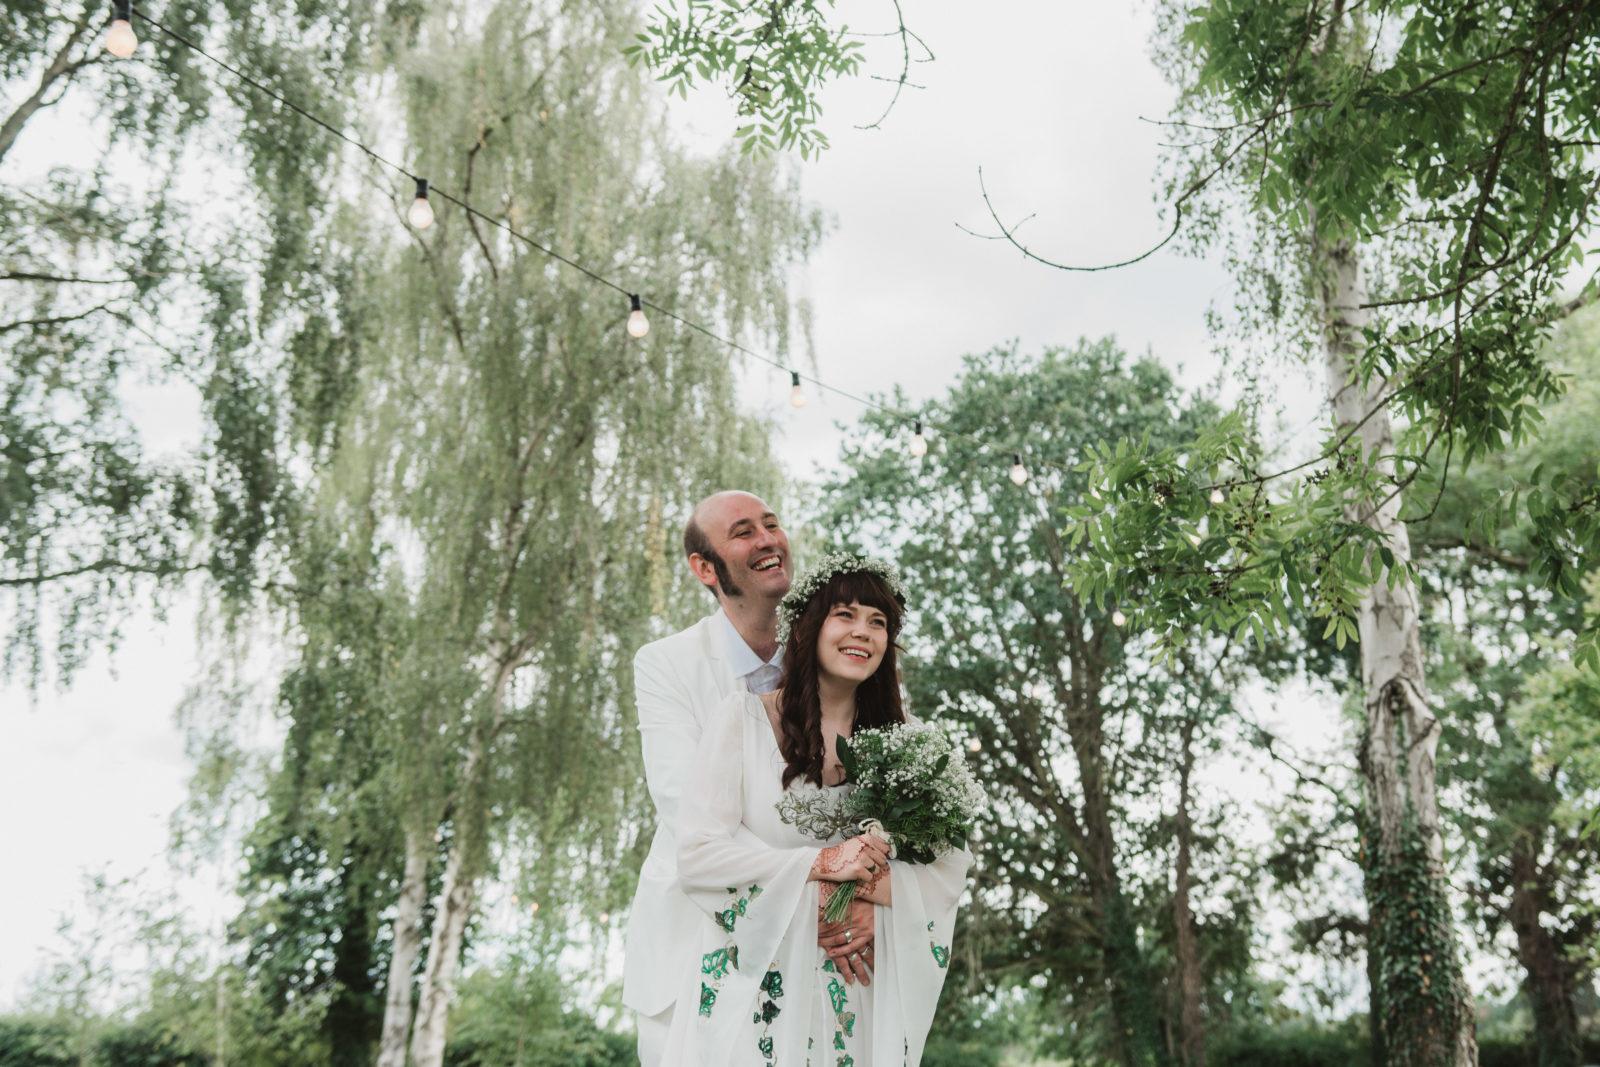 bride and groom hugging at unique suffolk wedding venue upthorpe wood